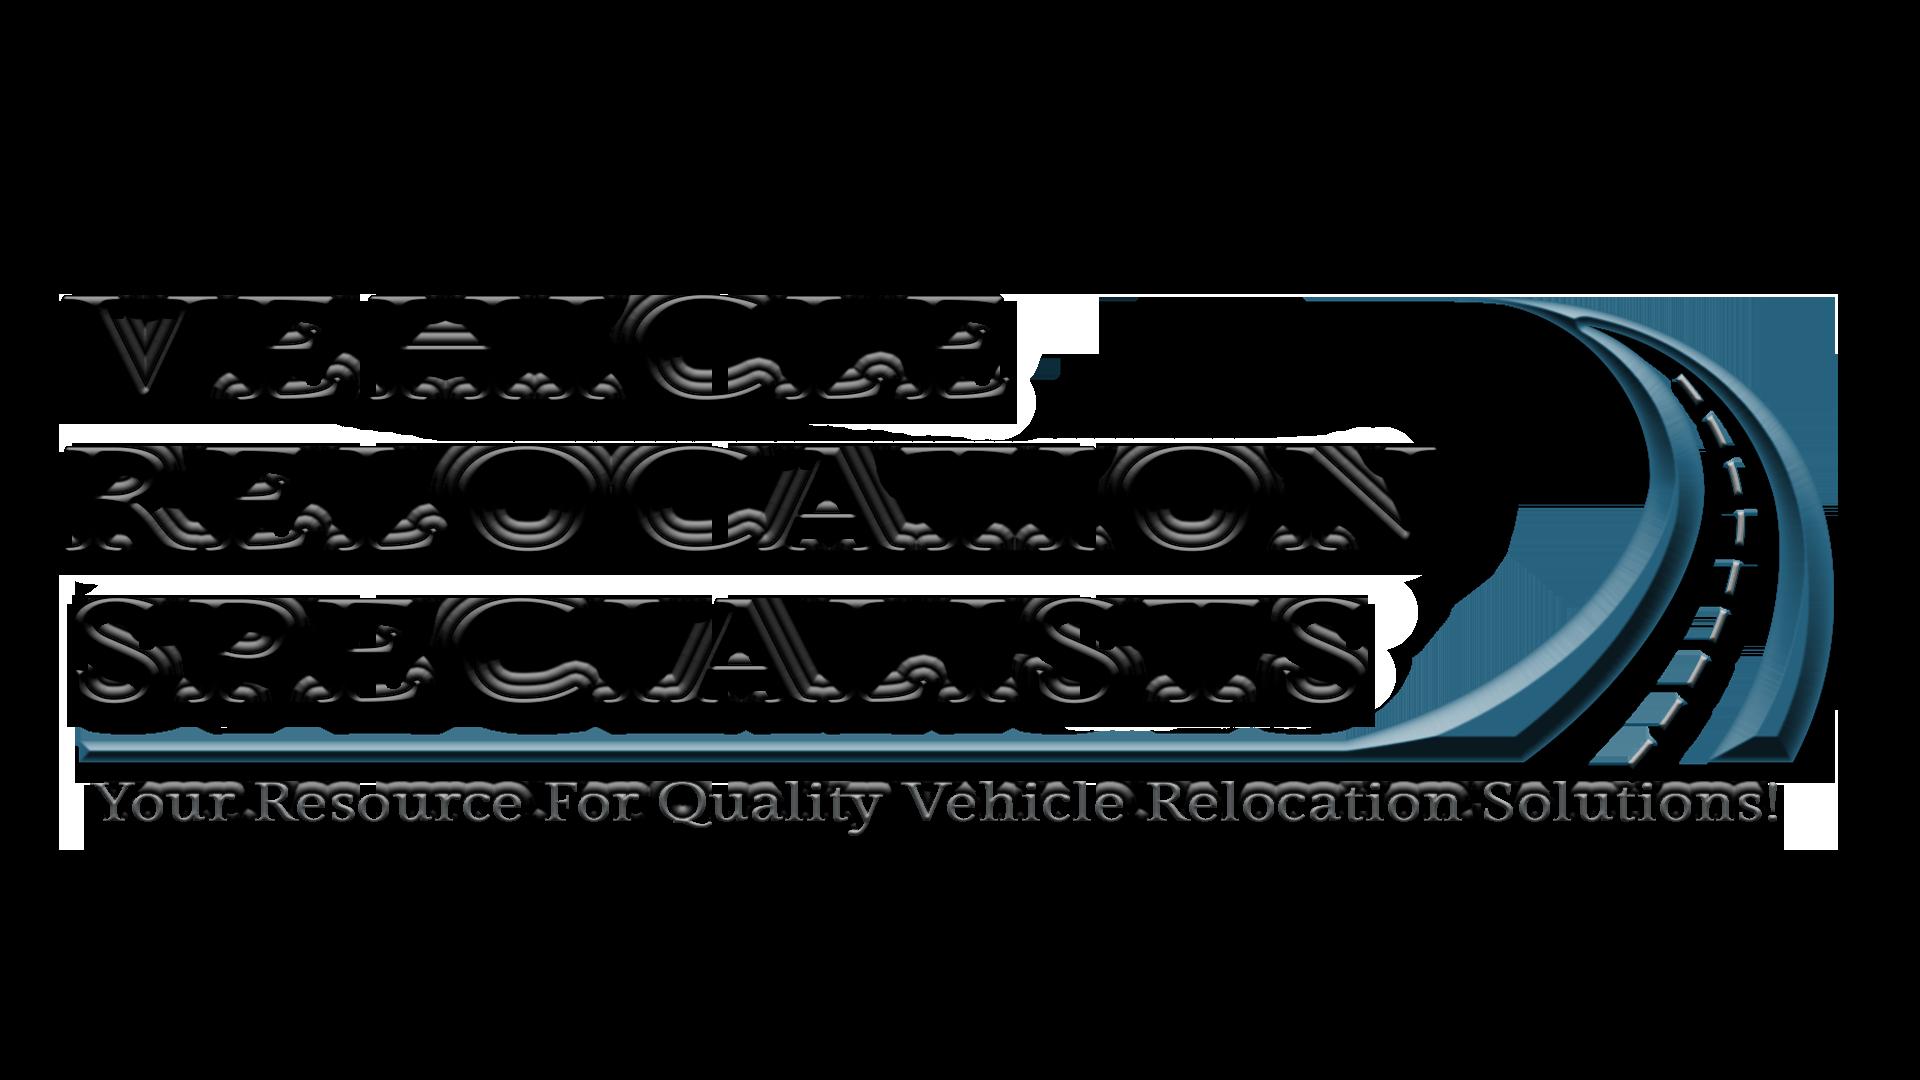 052ca0a2-254c-406d-9c1c-4bf47493937fVRS 19 Logo